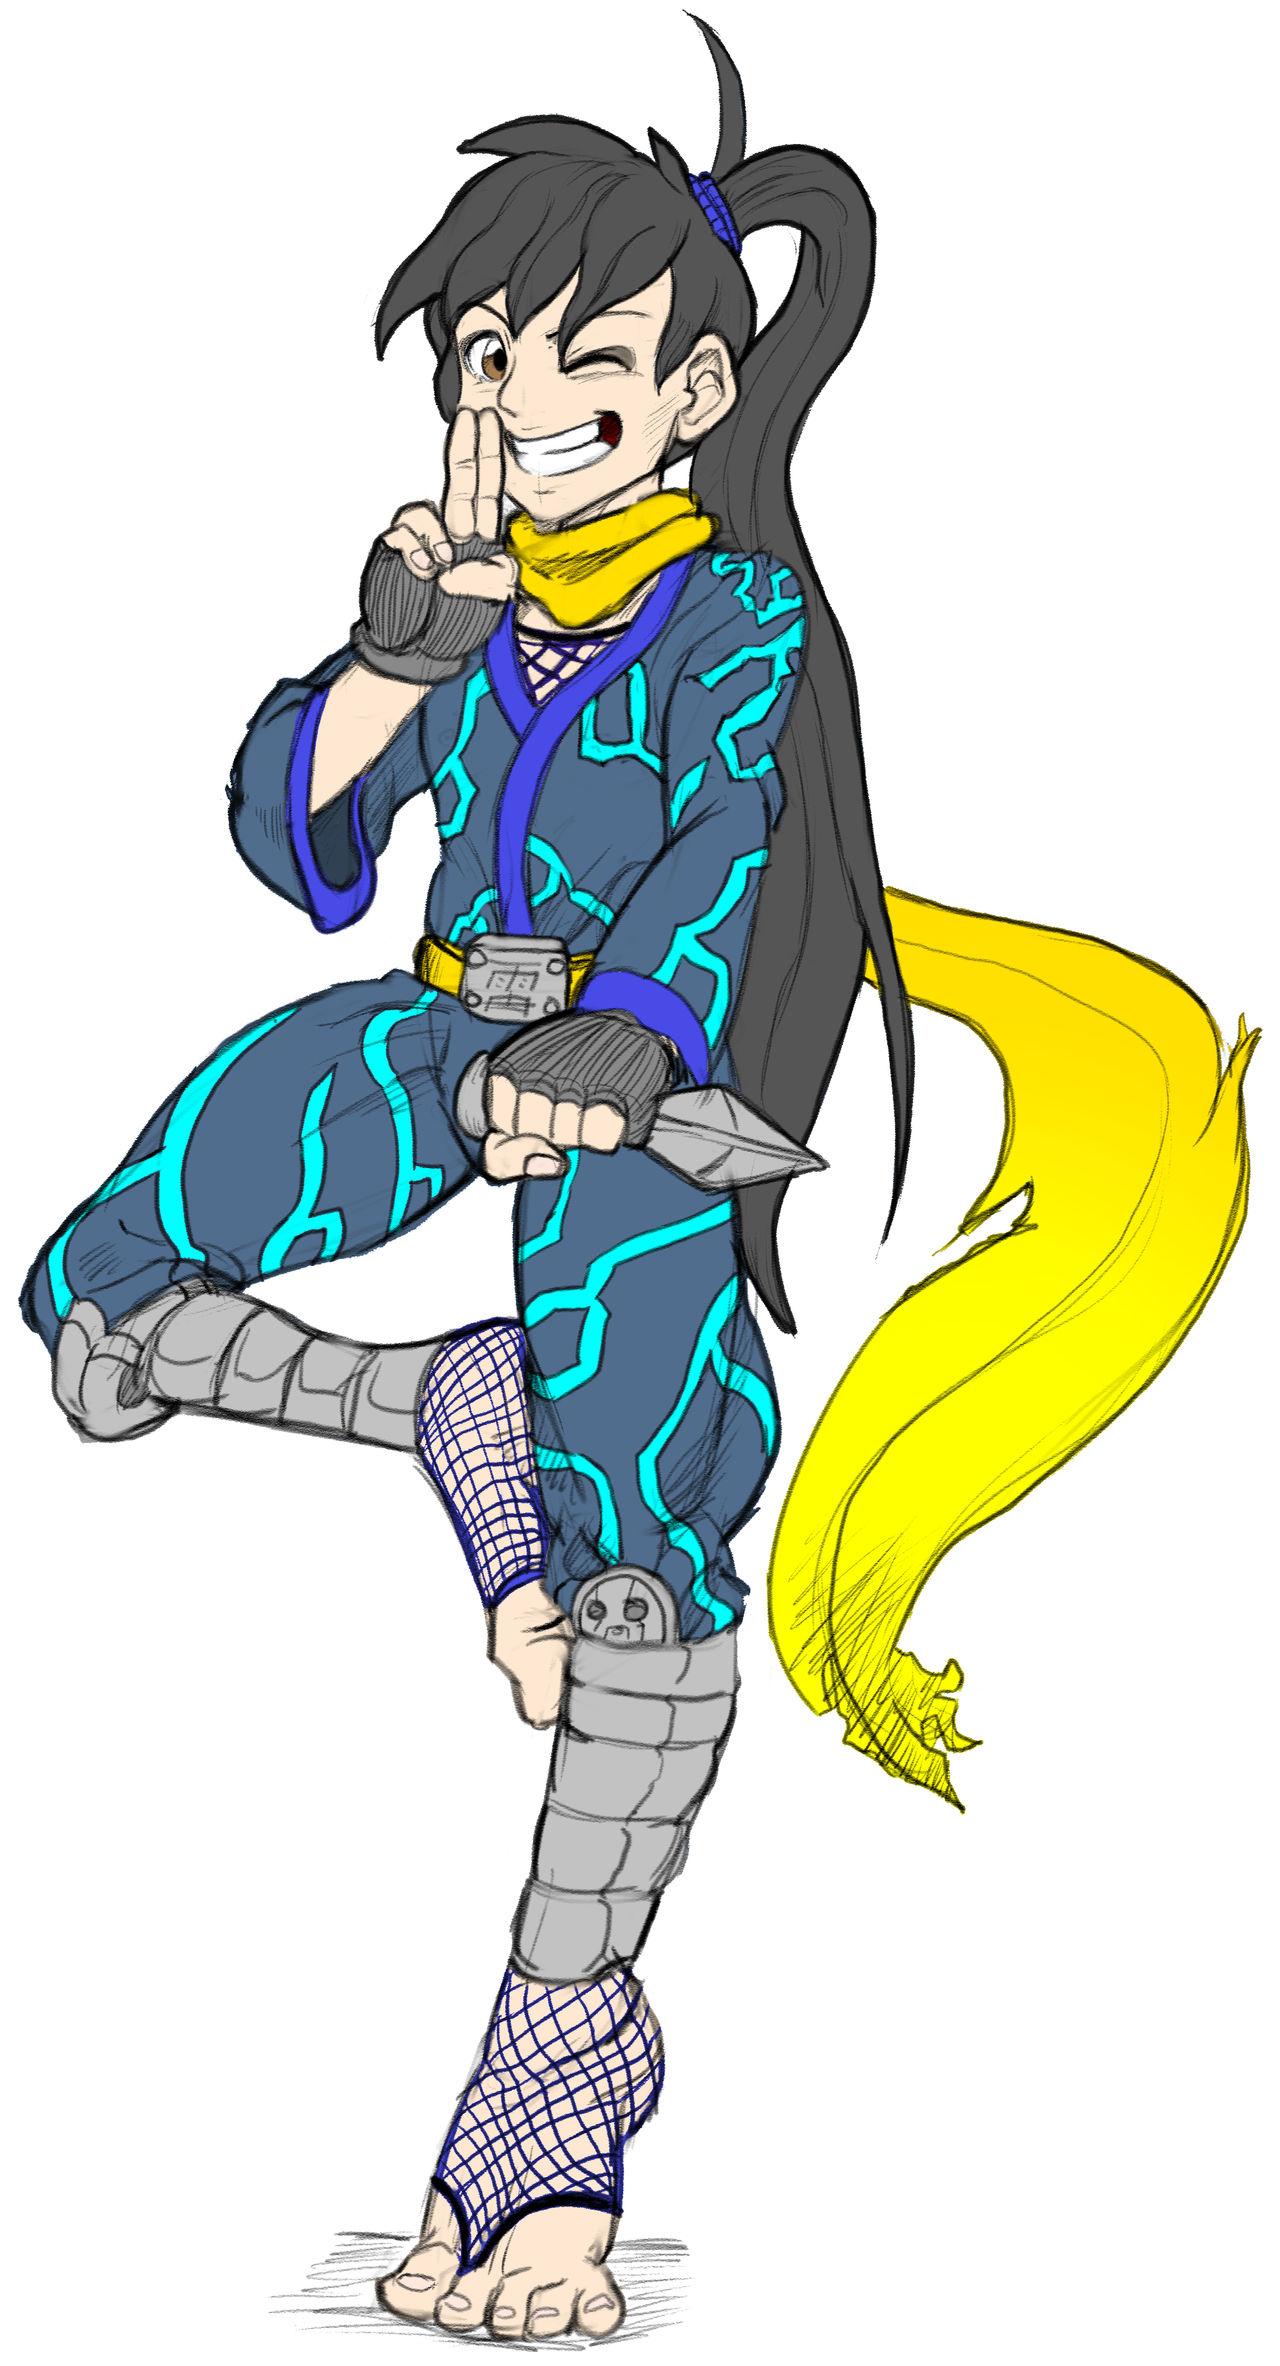 Raiju Inarizushi The Thunder Hound Oc By Shadow Aspect On Deviantart 1 general armor mod socket. raiju inarizushi the thunder hound oc